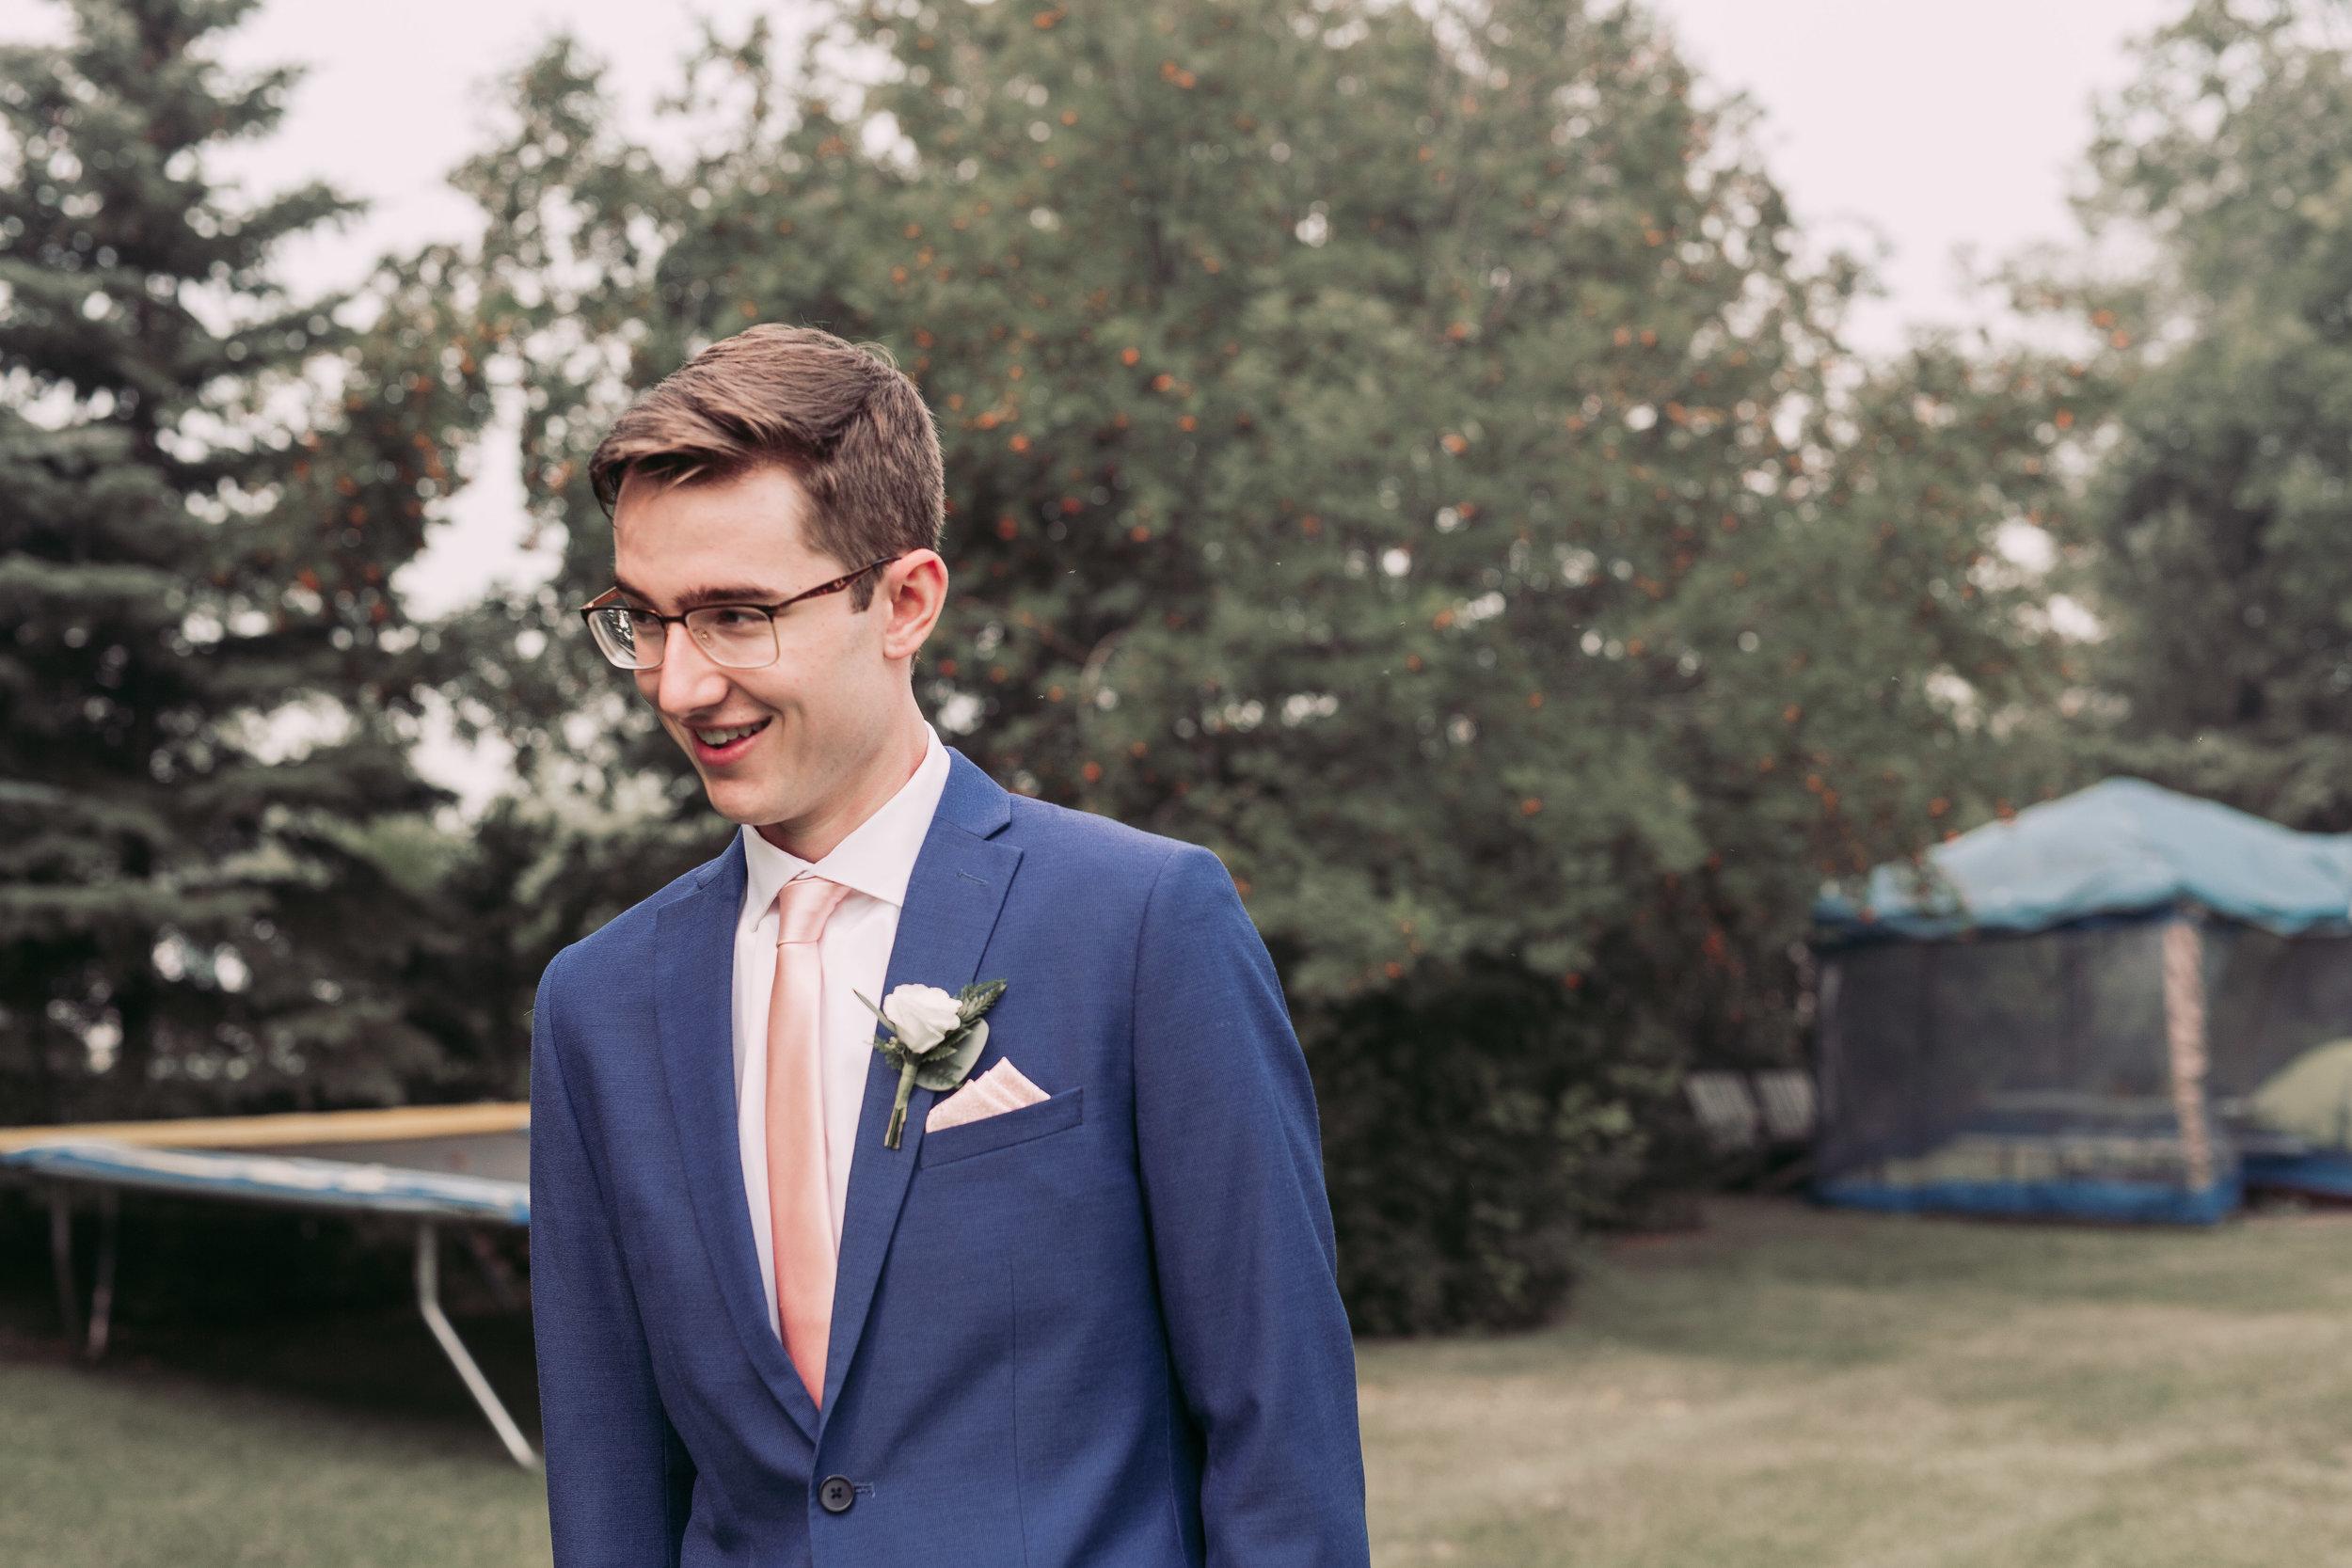 Wedding Day-276.jpg